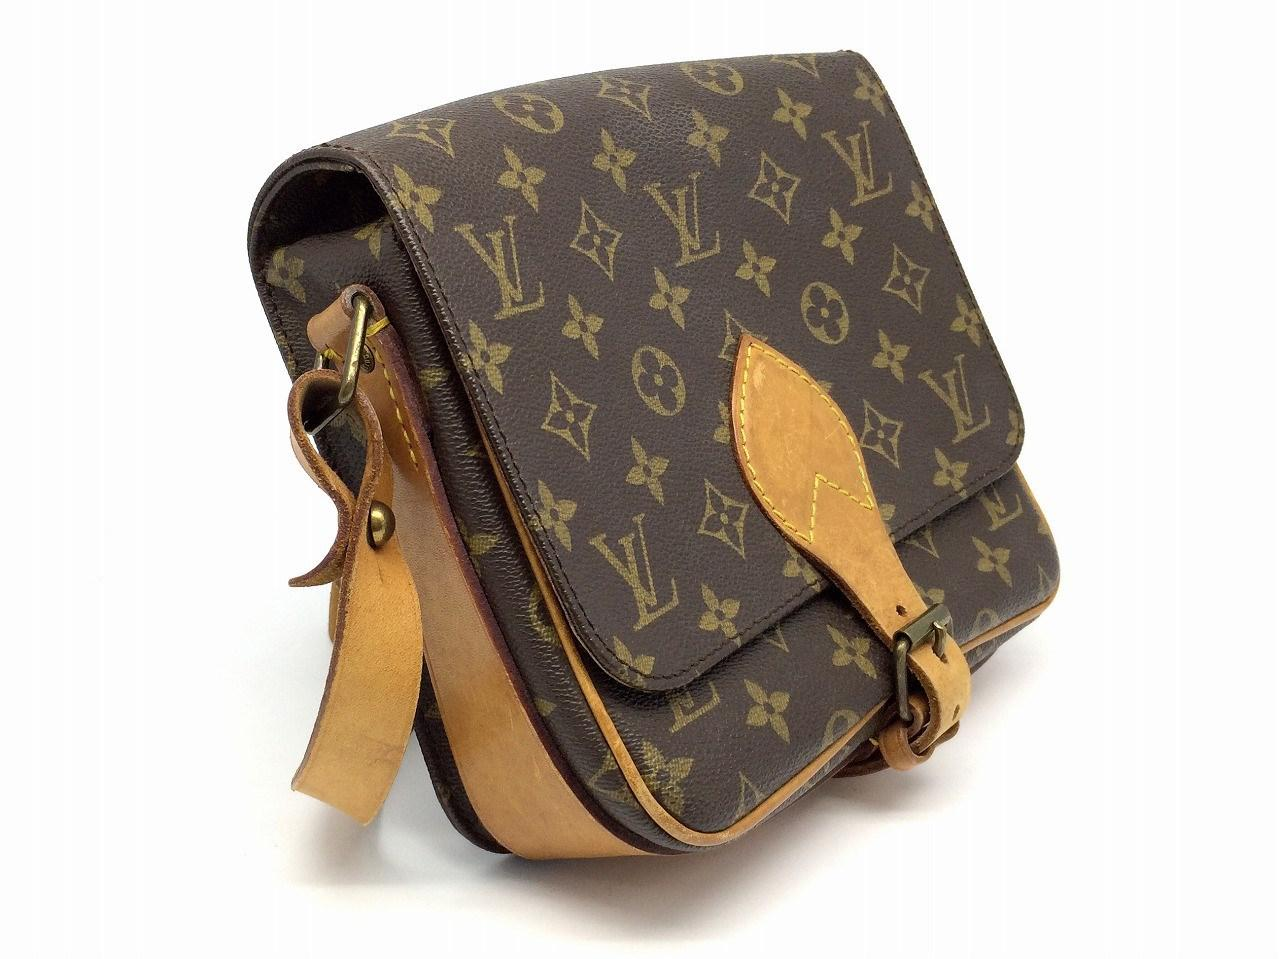 5396450e9ac6 Louis Vuitton - Cartouchiere Shoulder Bag Monogram Brown M51253 6423 for Men  - Lyst. View fullscreen